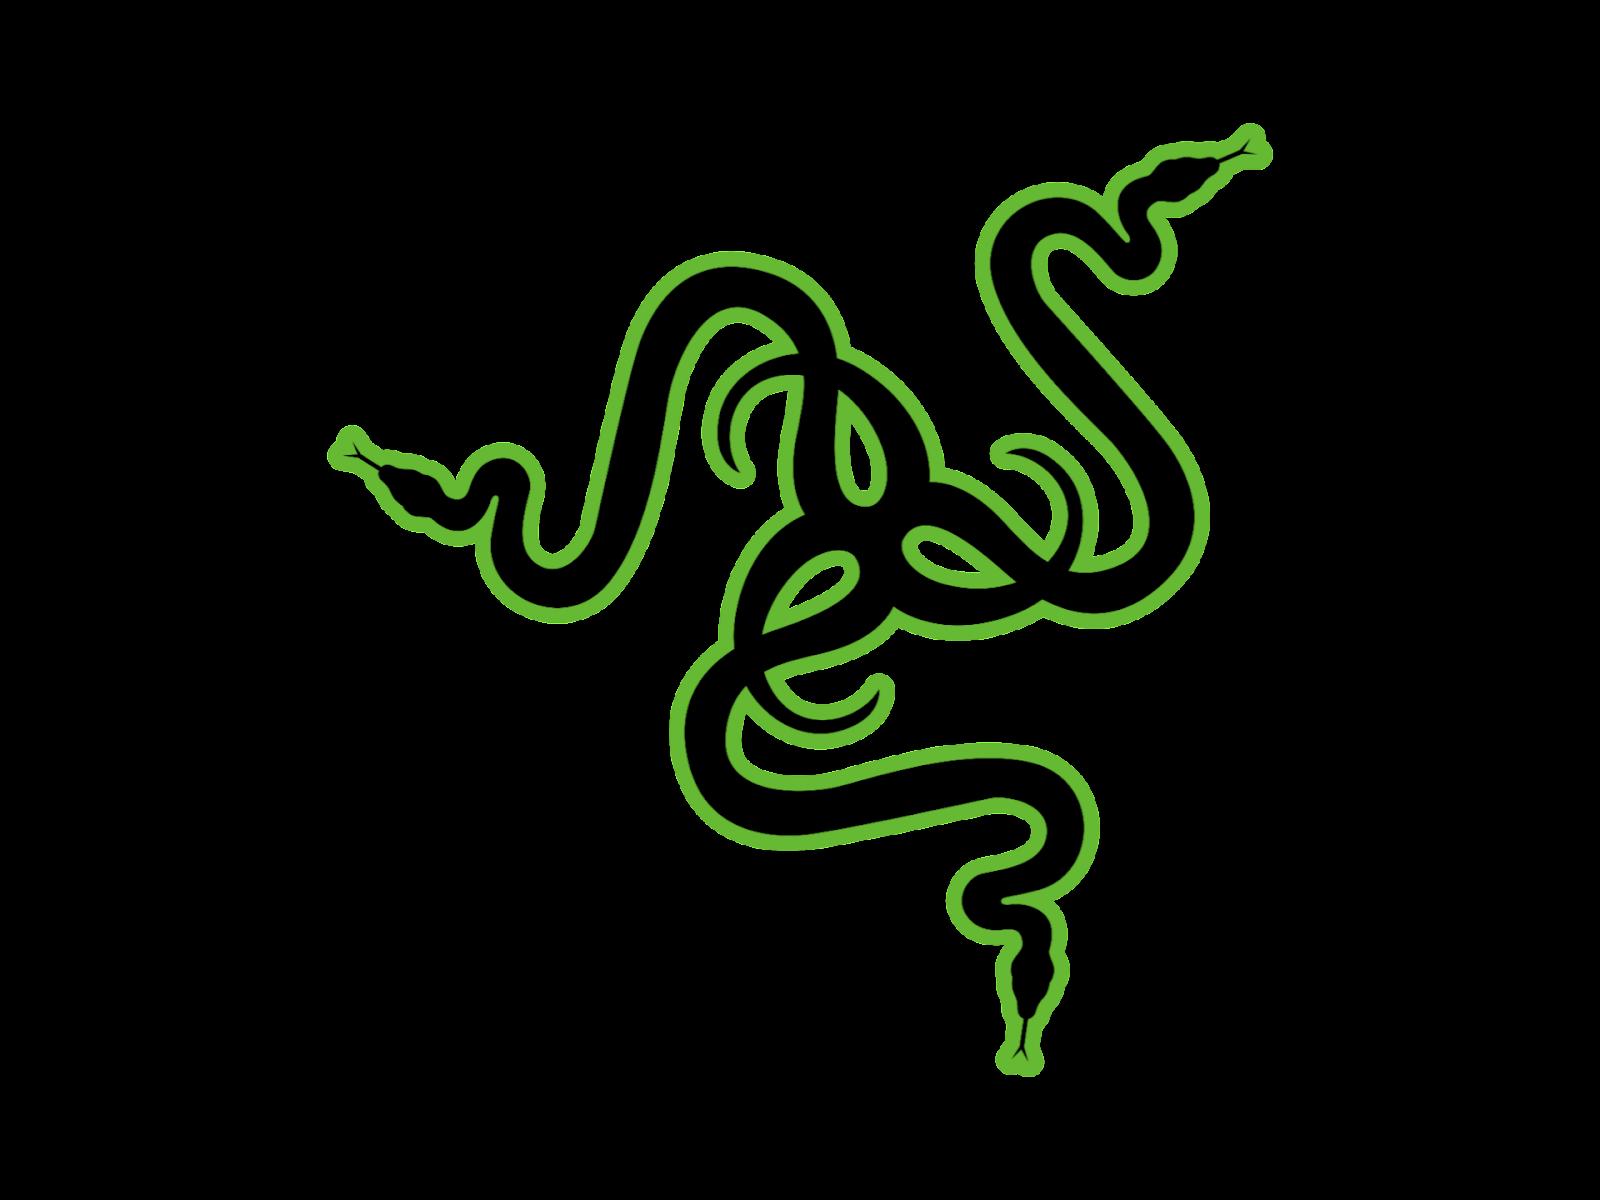 Logo Razer Format PNG